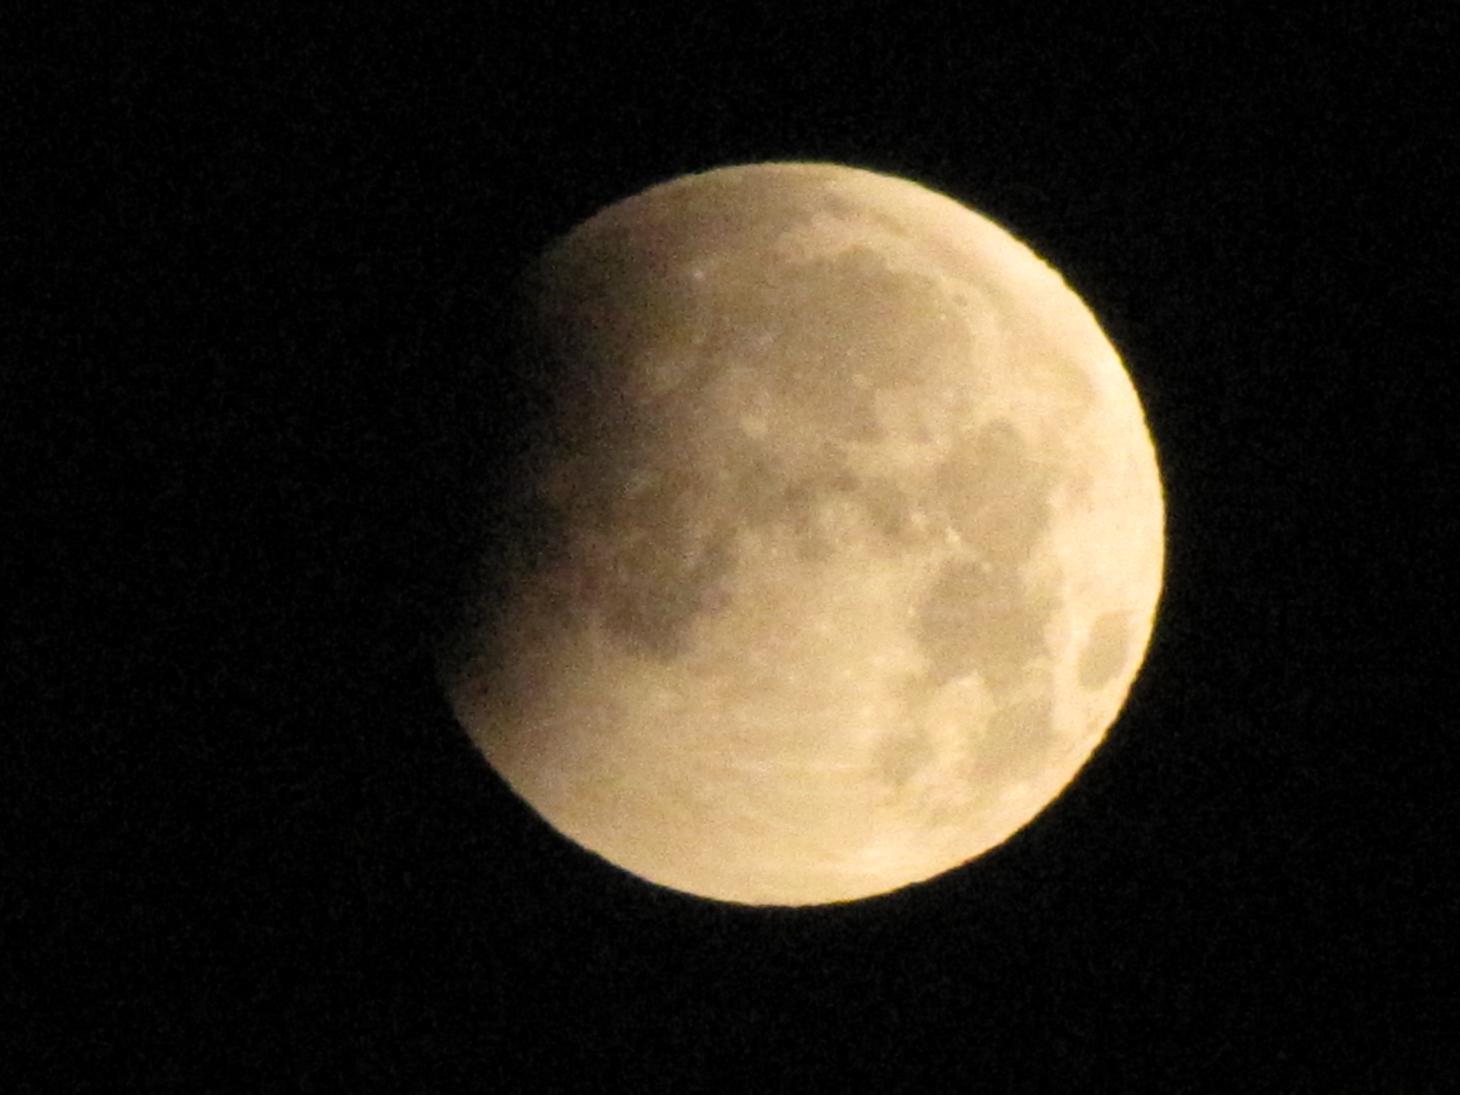 maansverduistering 21-12-10